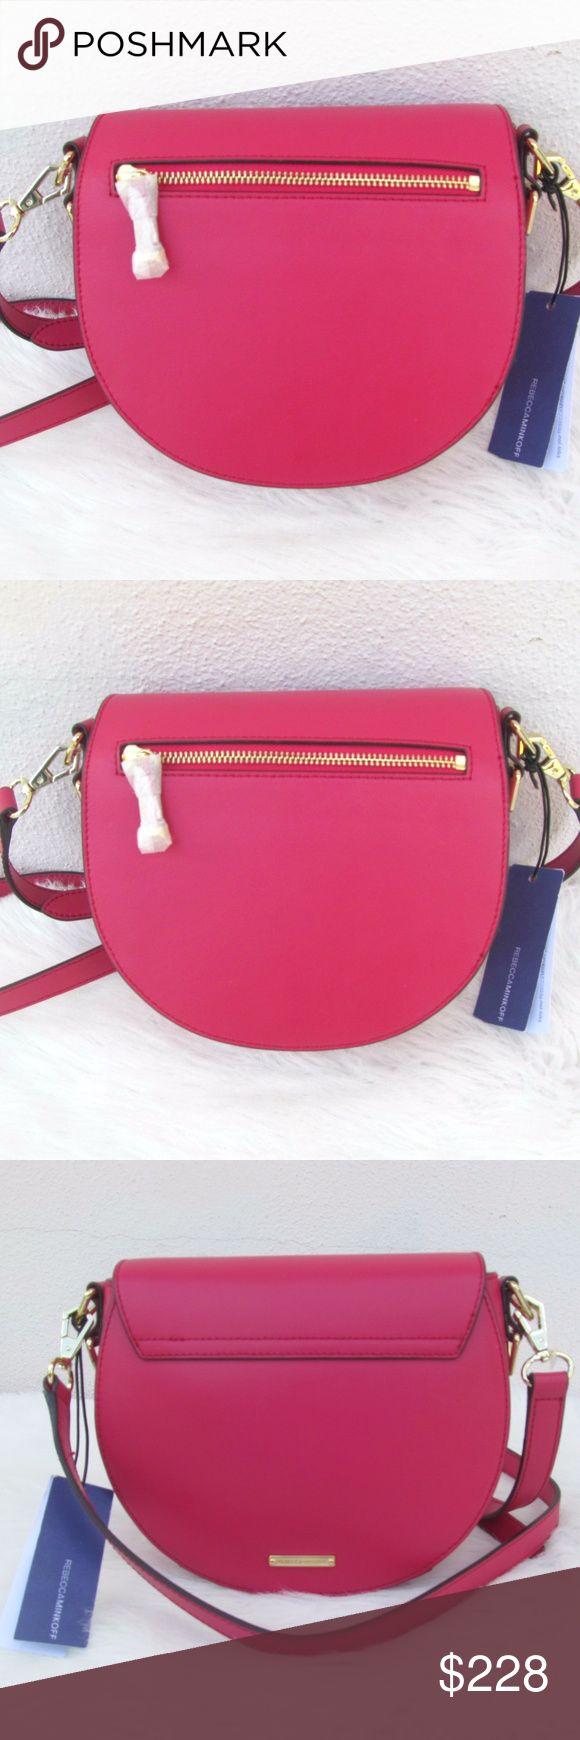 Rebecca Minkoff Astro Saddle Crossbody Bag Brand new and 100% authentic guaranteed! Rebecca Minkoff Bags Crossbody Bags